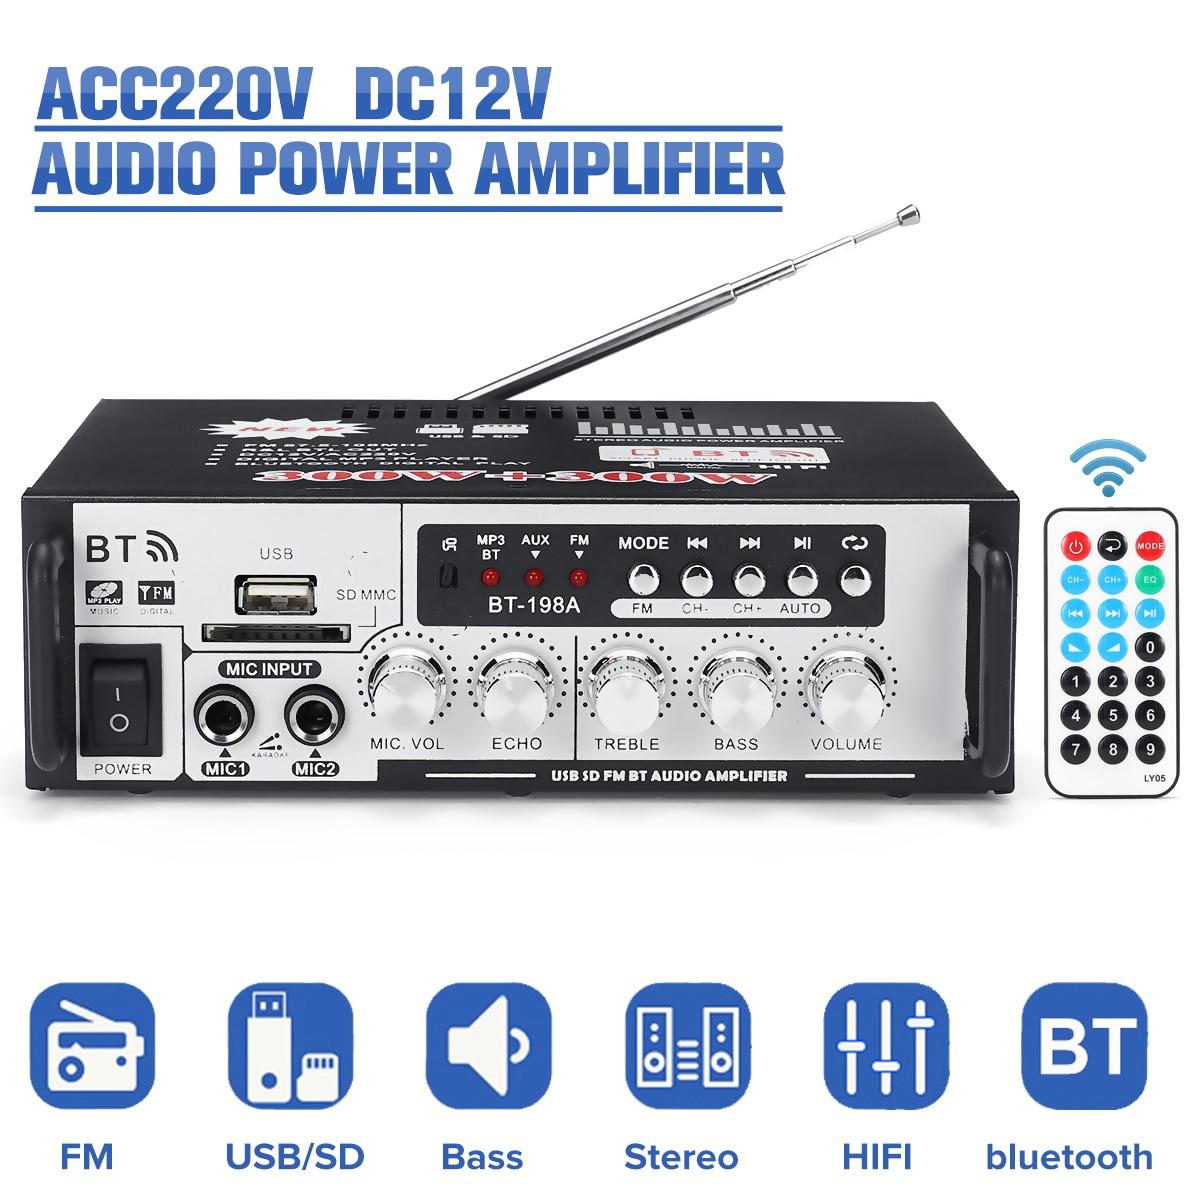 AC220V DC12V HIFI Power Amplifier Wireless Bluetooth Bass Audio FM Radio U Dish TF Card Power Amplifier Home Amplifier